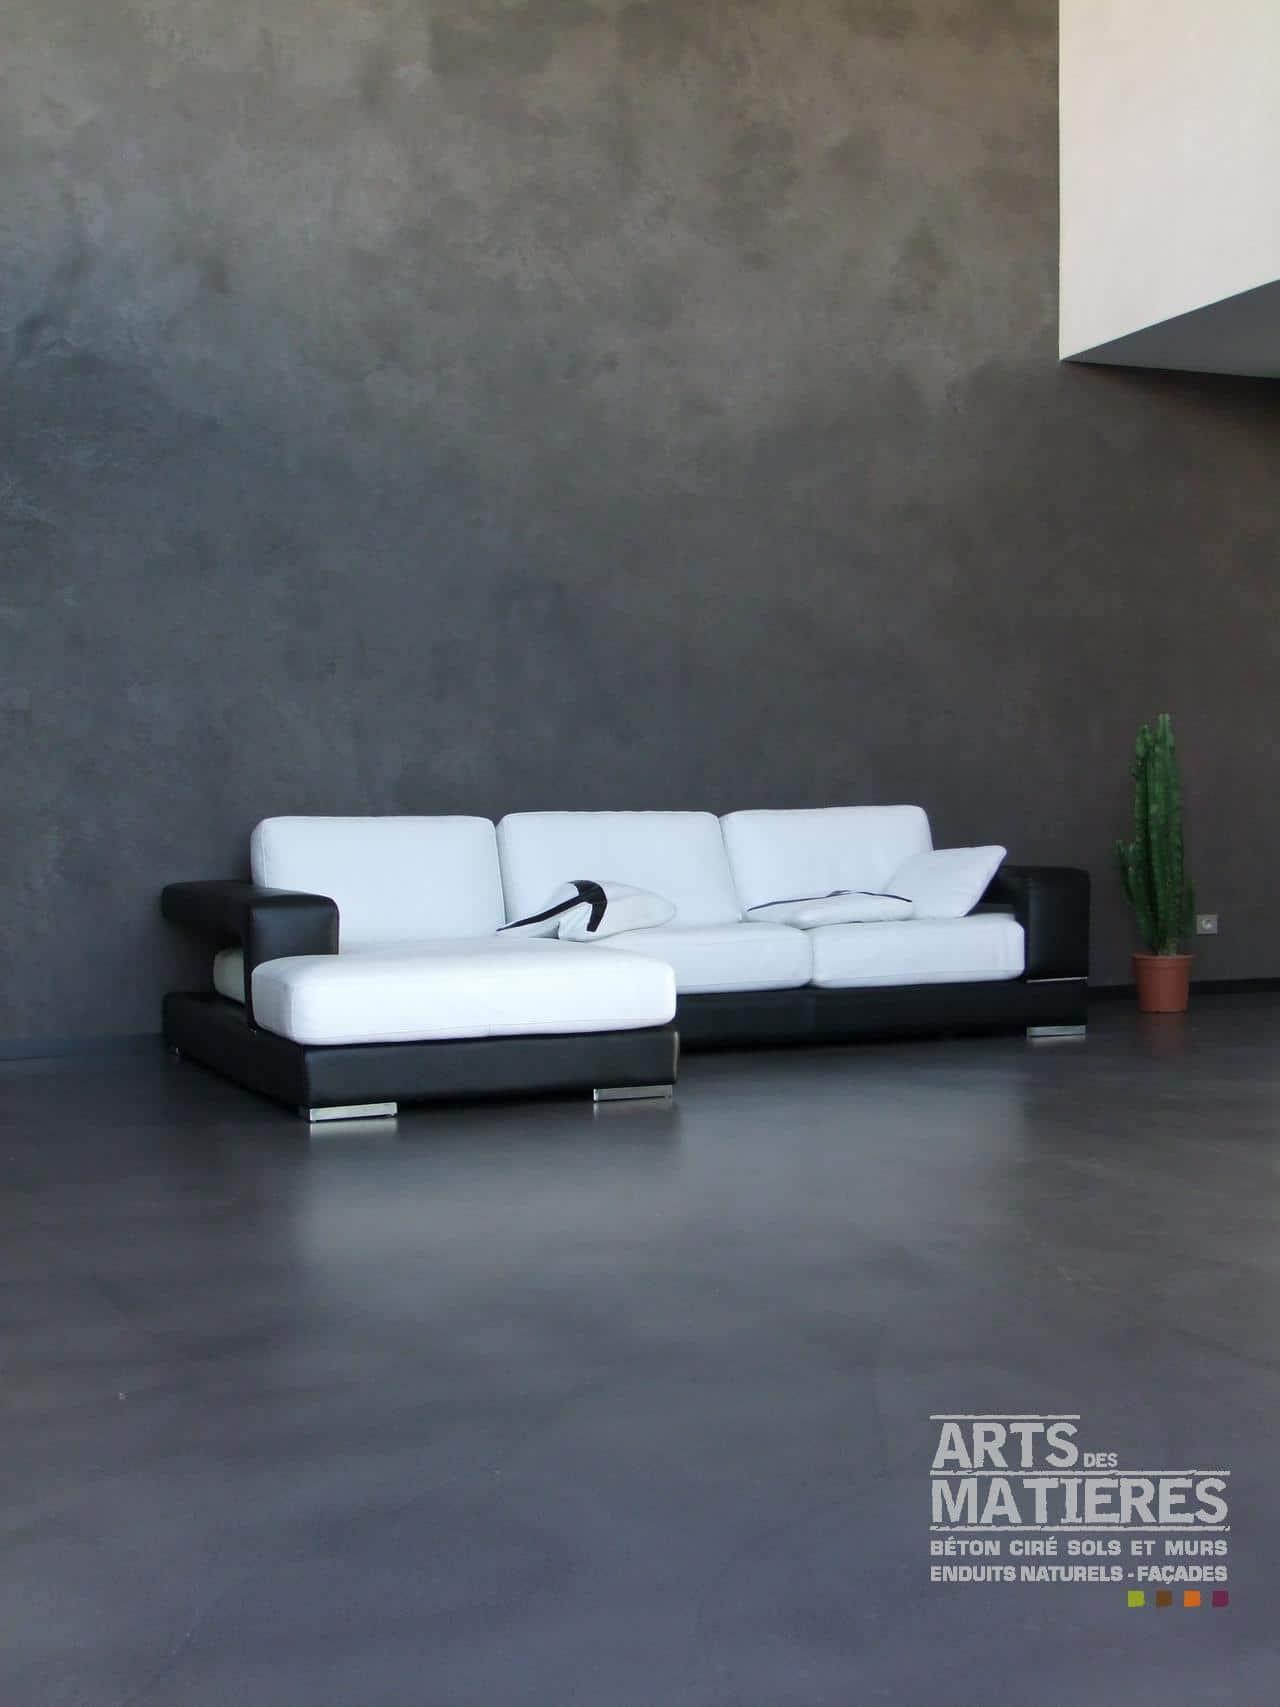 Effet b ton brut ou effet pierre b ton cir enduits for Mur beton cire salon